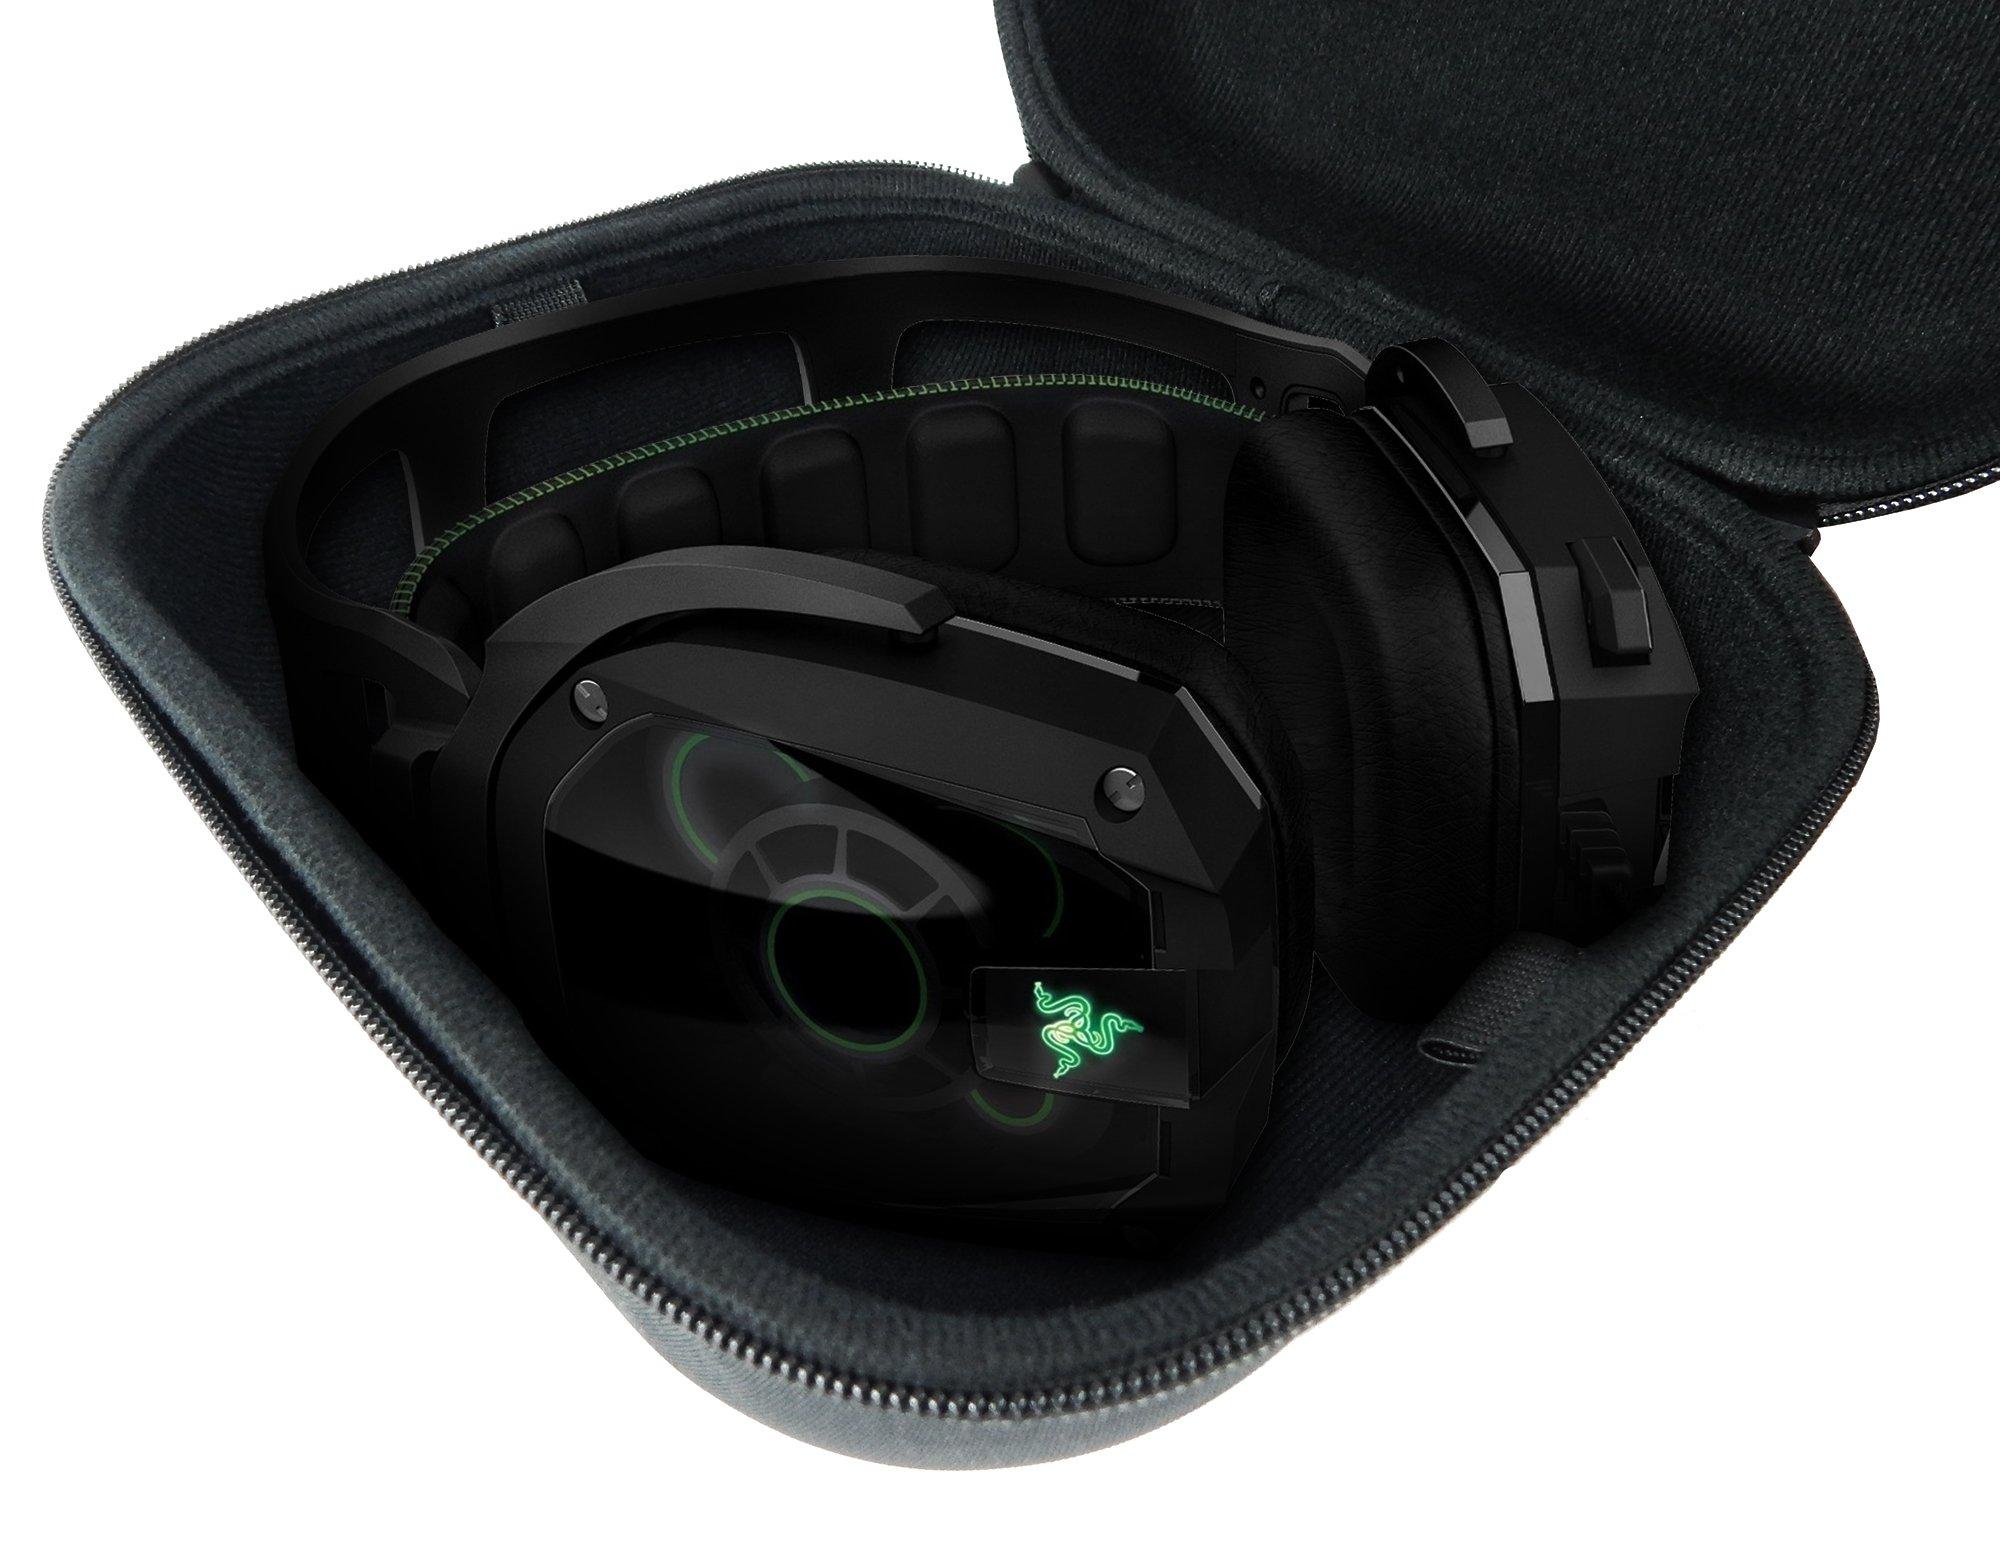 CASEMATIX Travel PC , MAC USB Gaming Headset CarryCase Bag – Fits Razer Kraken Pro 7.1 Chroma , Razer ManO'War , Tiamat , Overwatch ManO'War Tournament Edition Wired or Wireless headphones